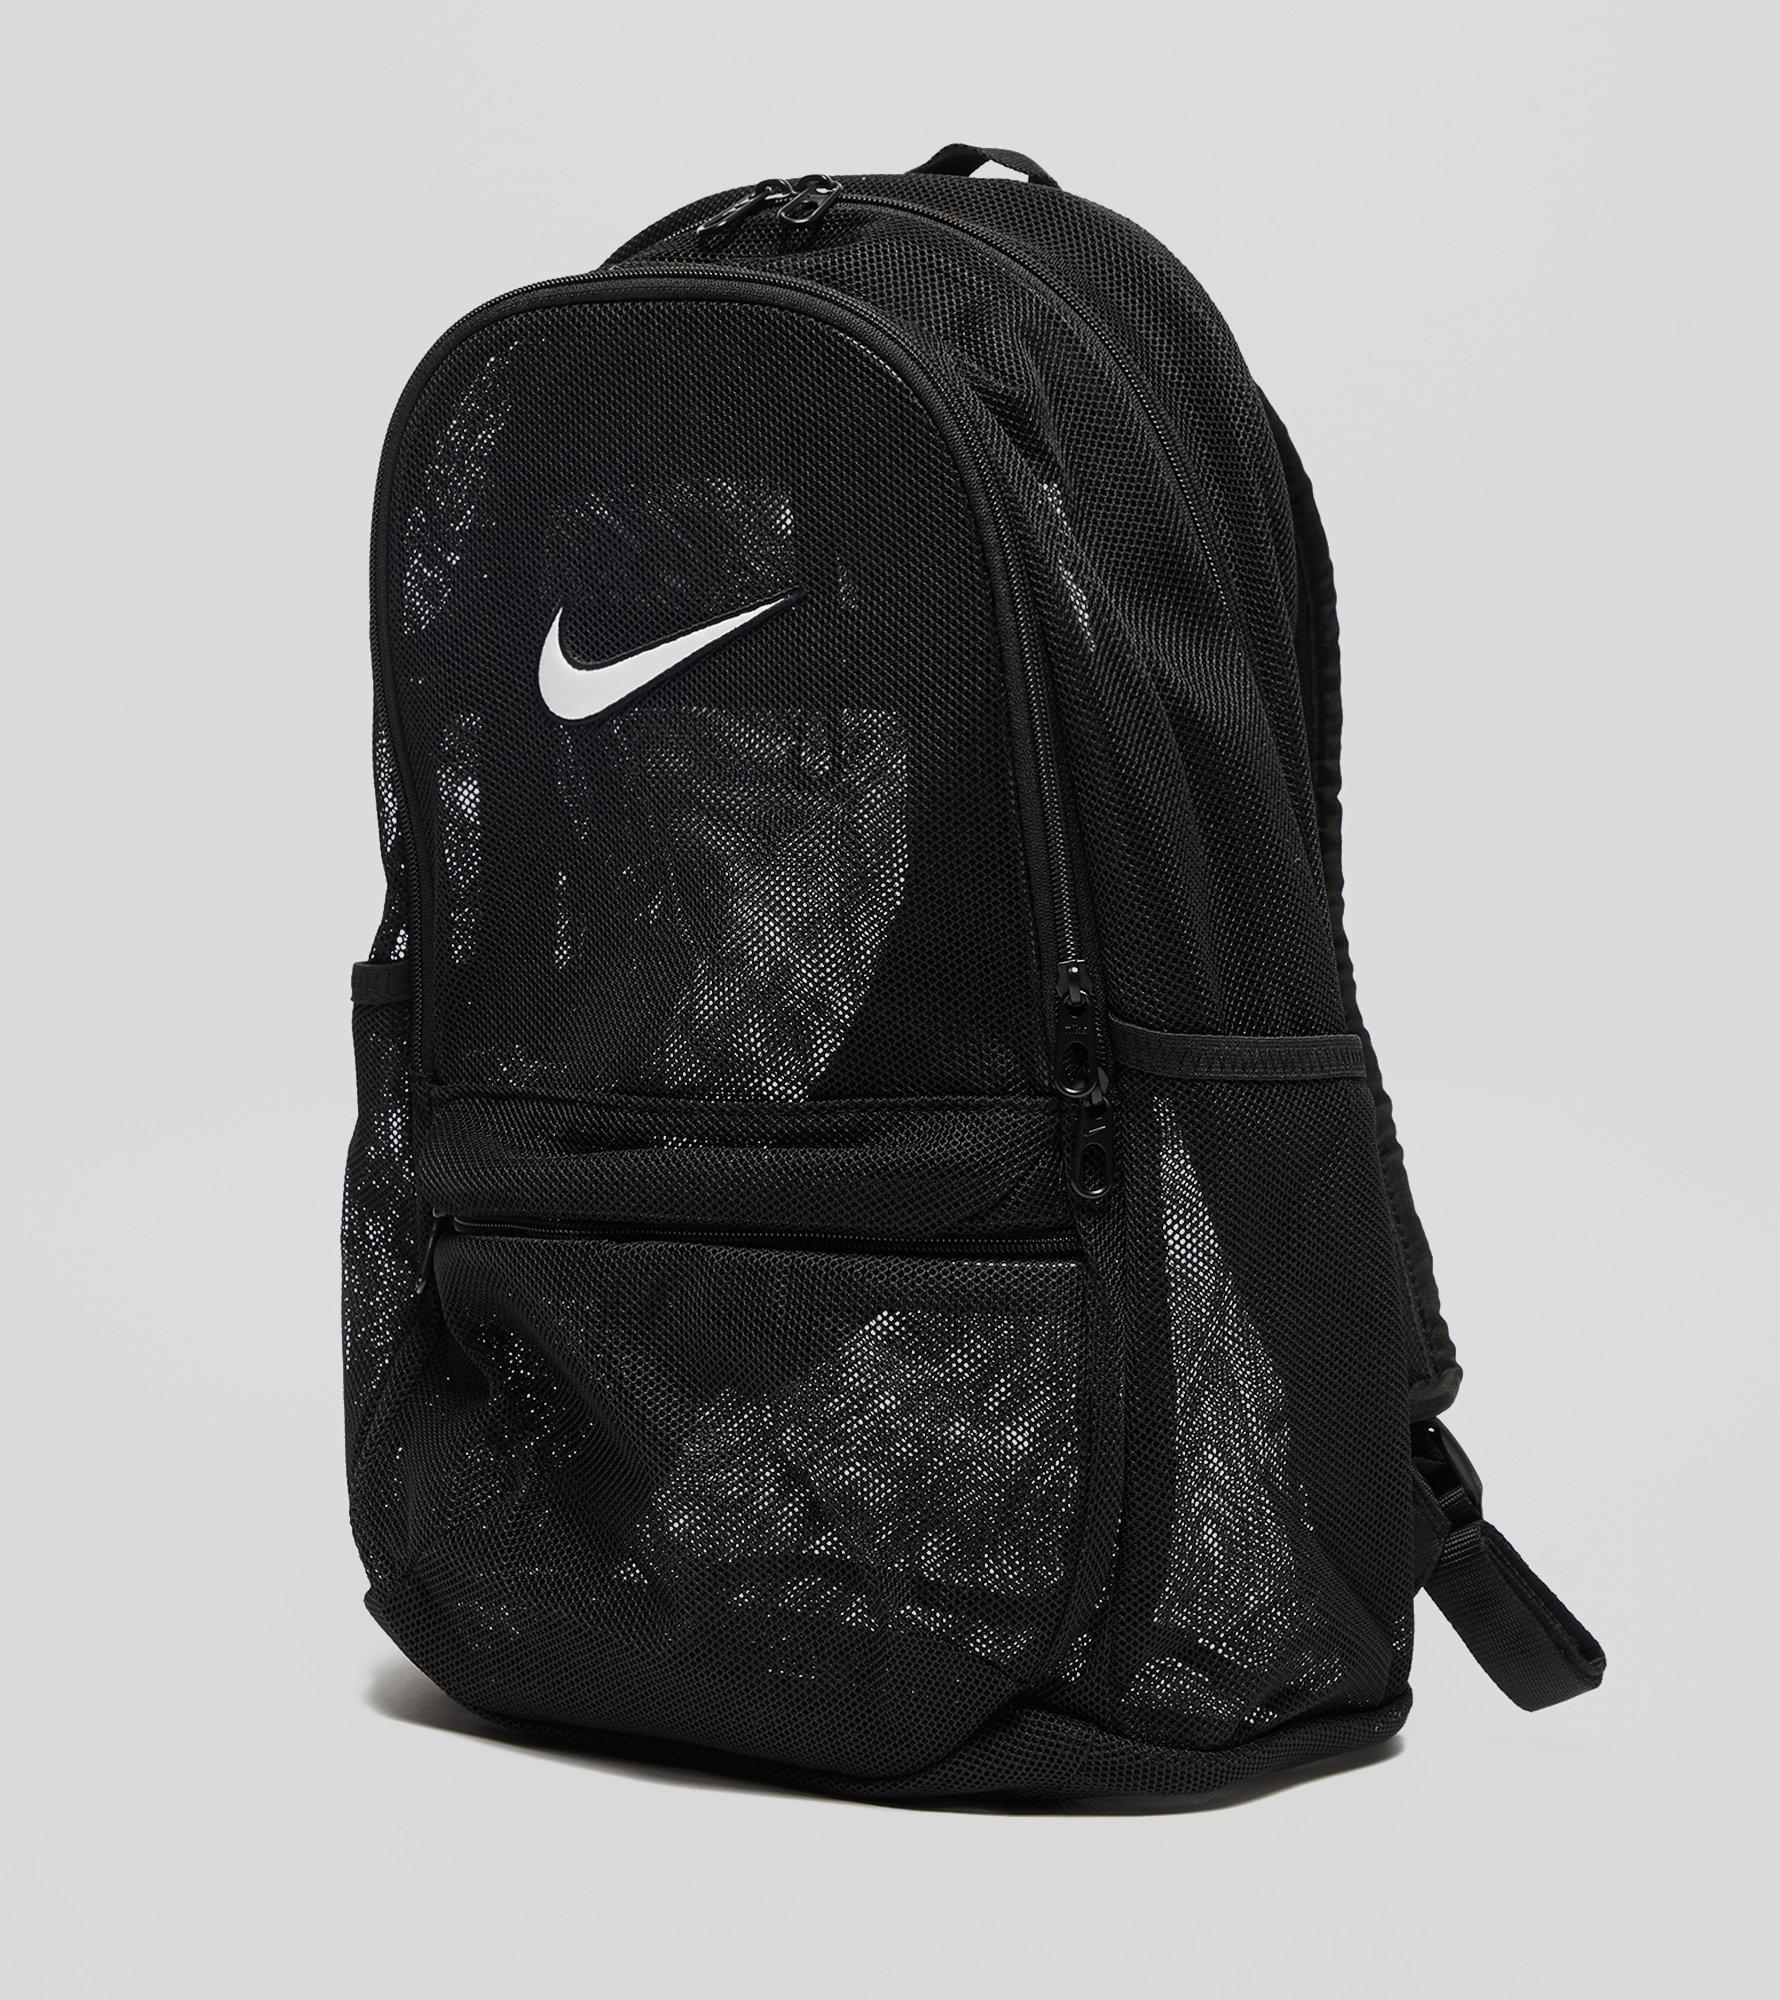 White mesh nike backpack fenix toulouse handball jpg 1780x2000 New nike mesh  backpacks 9d46d9e6ff44b